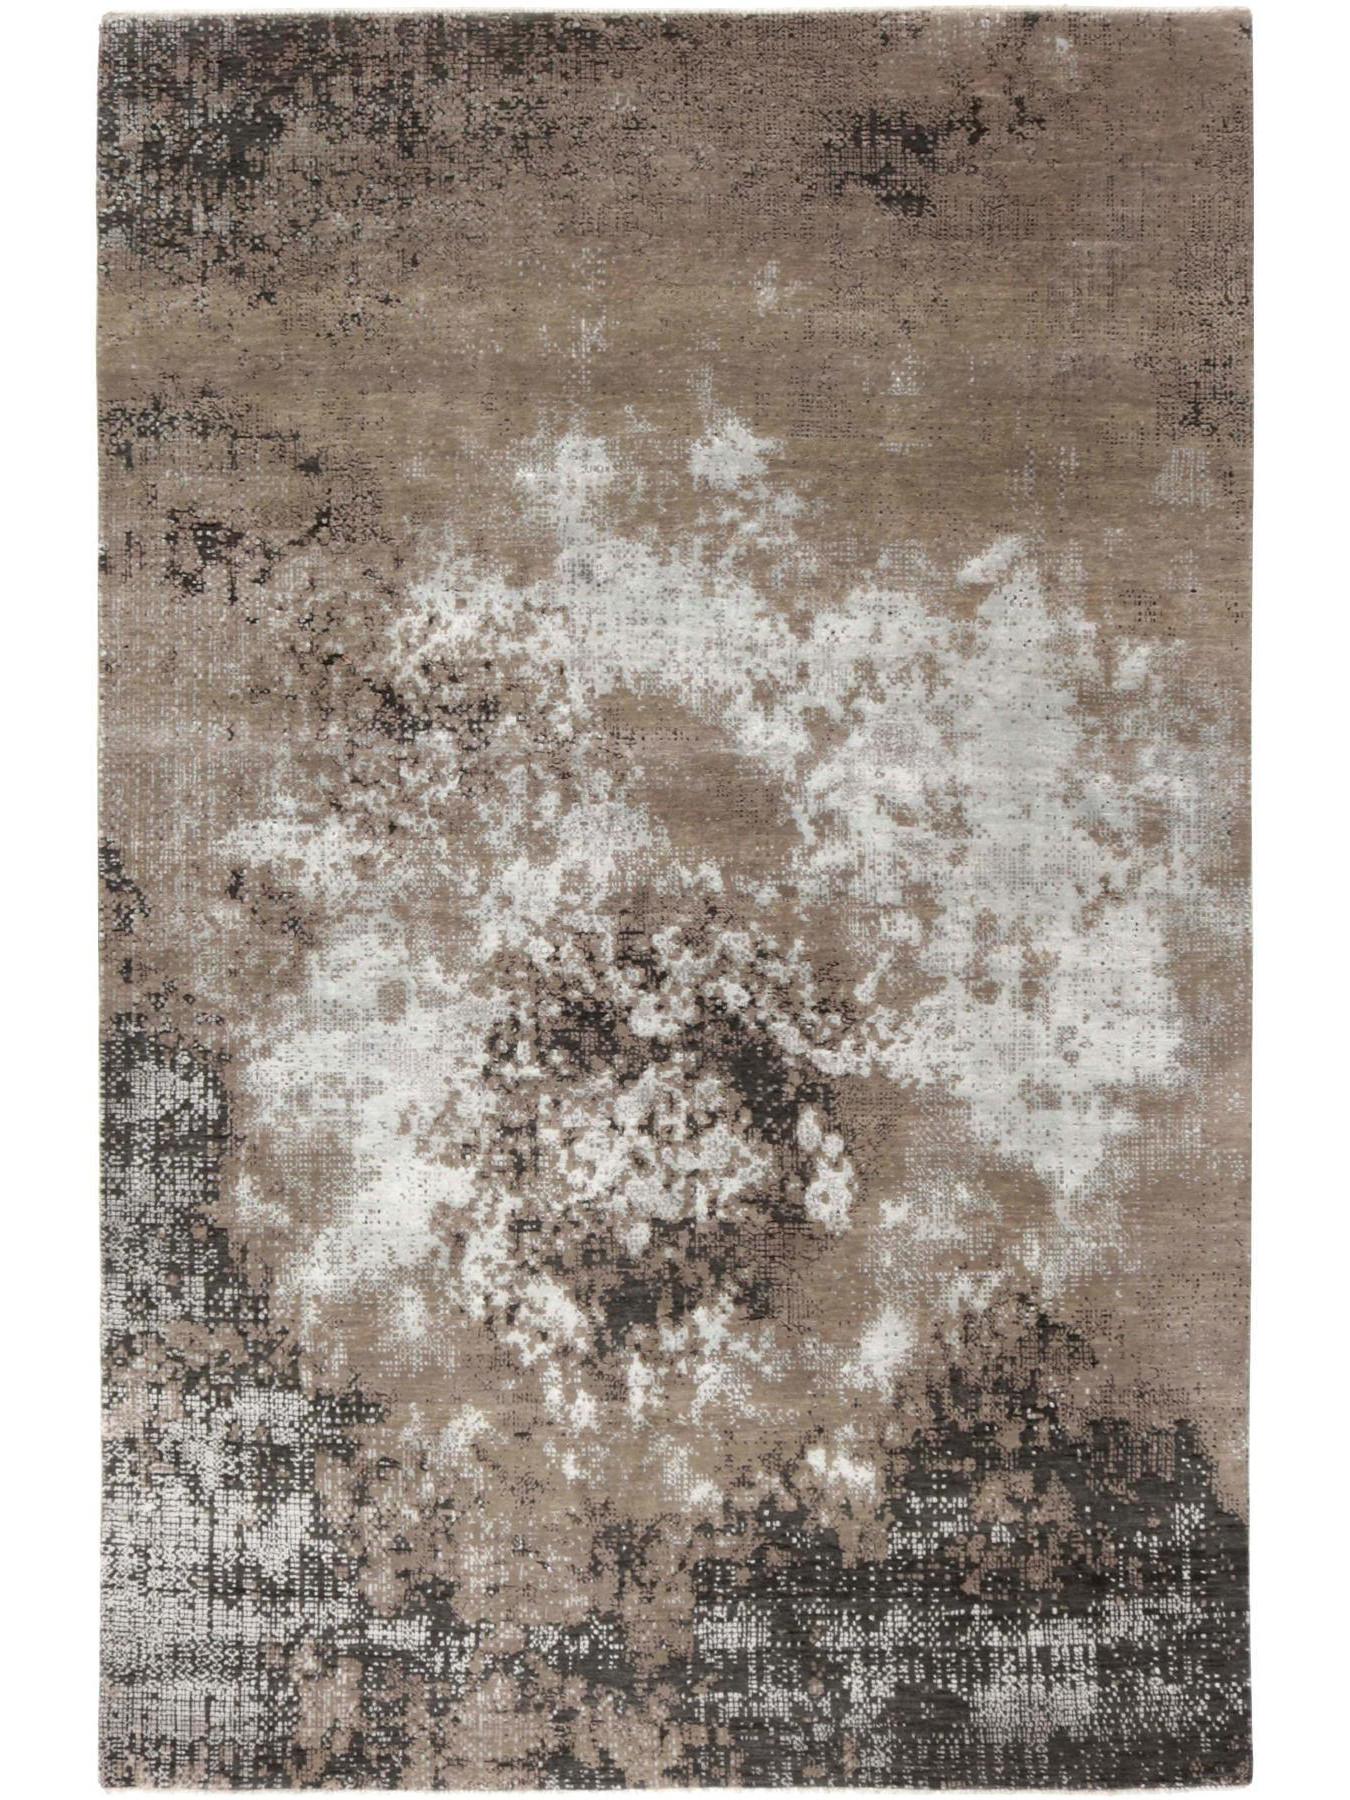 Design carpets - Seduction-840177